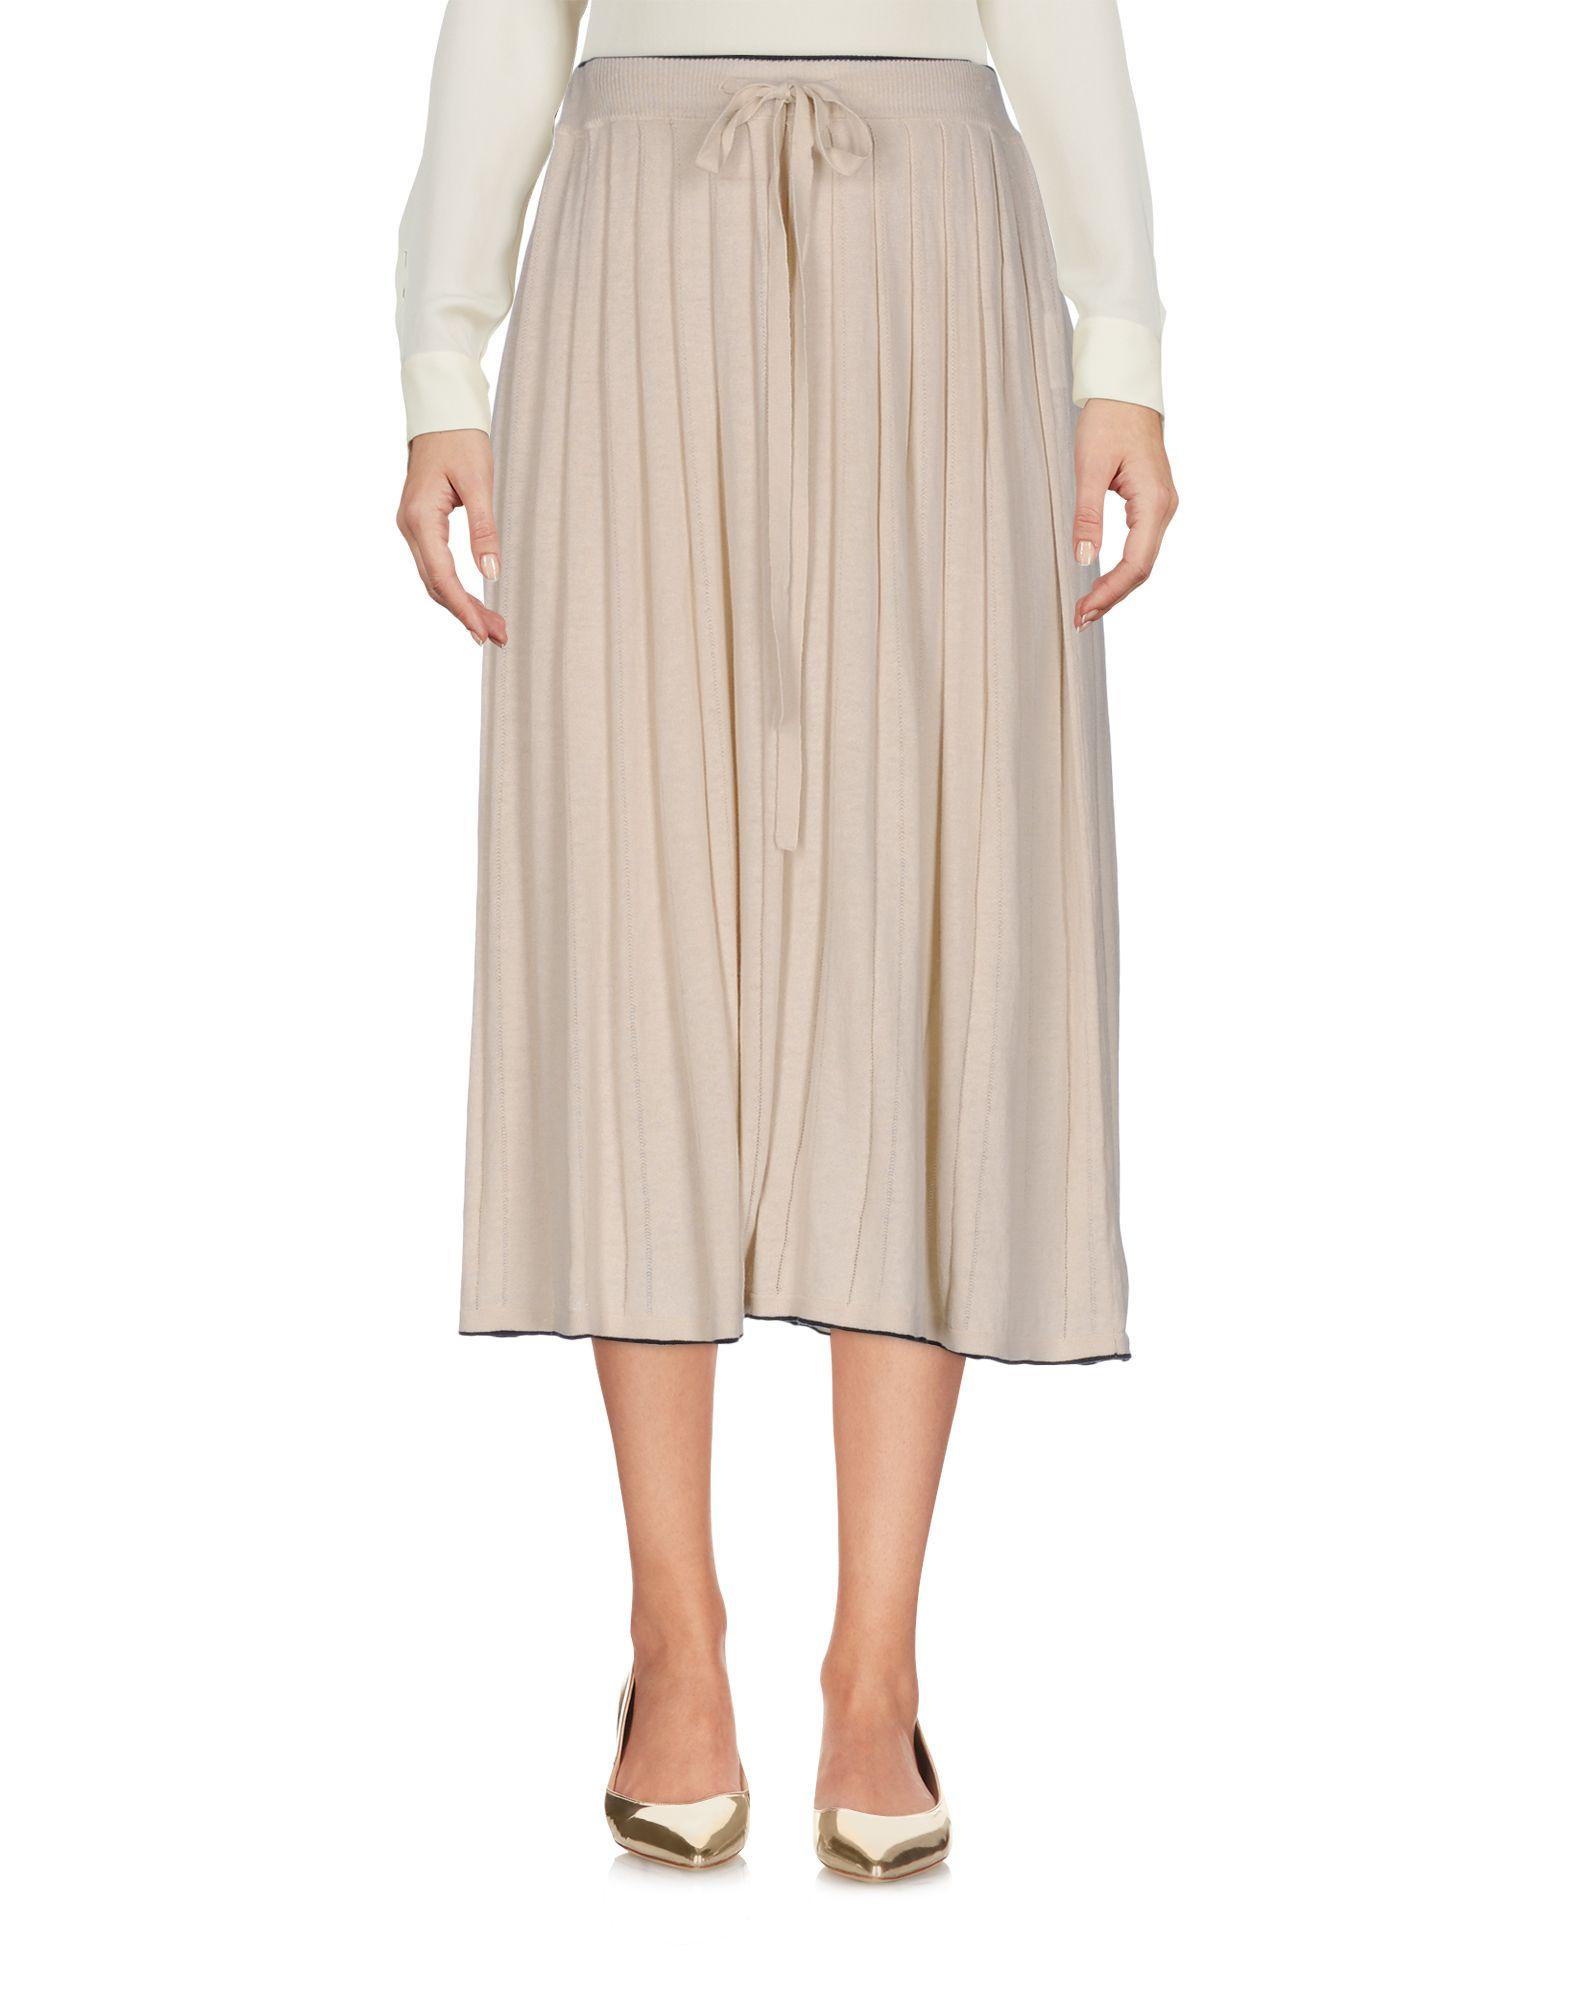 YOSHI KONDO Midi Skirts in Beige